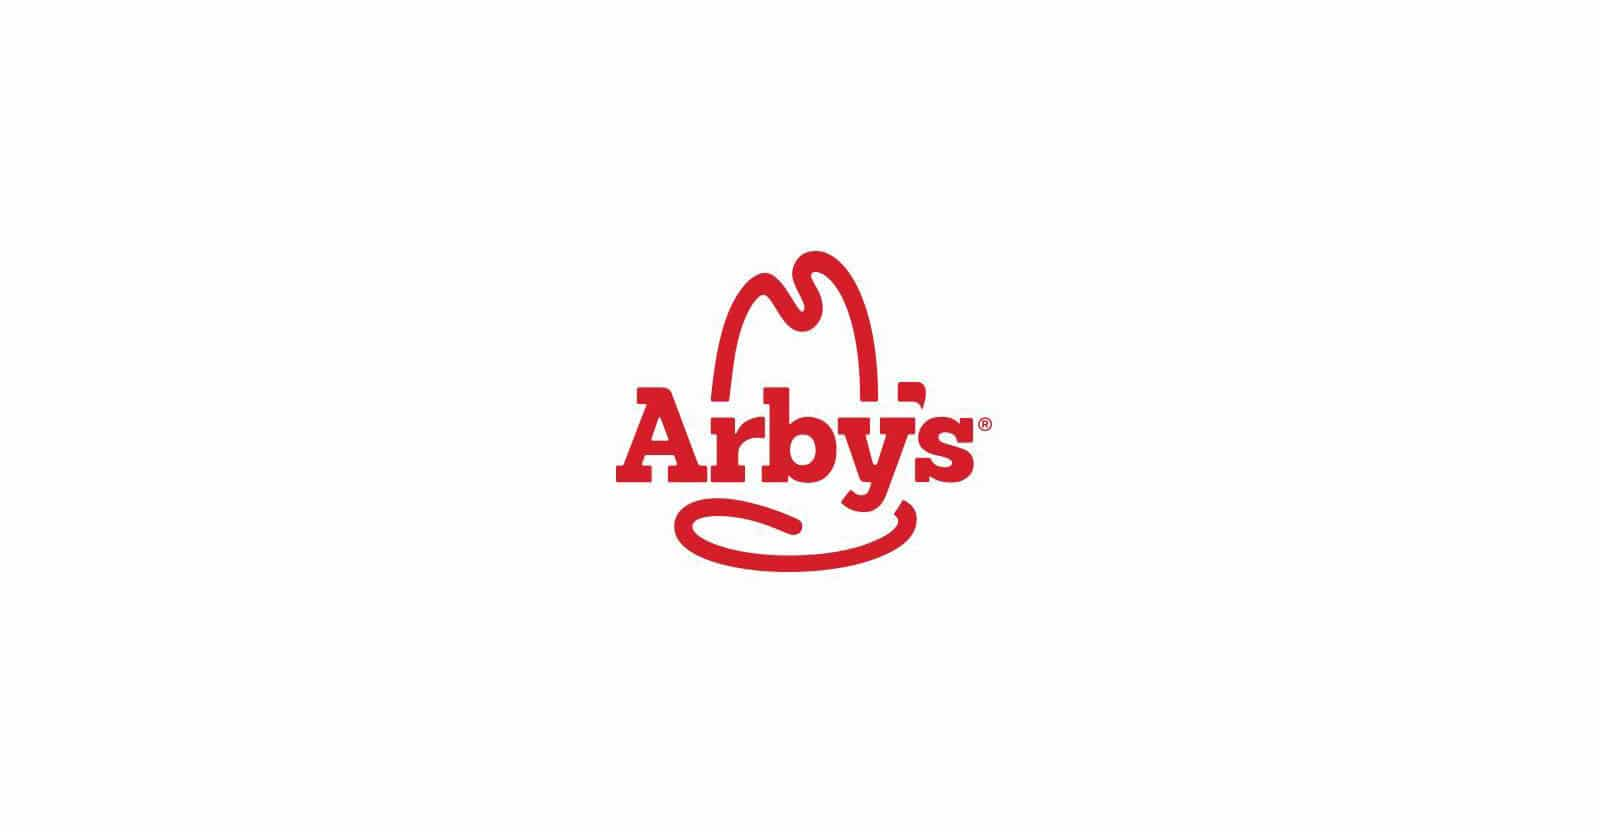 arby's gluten-free menu